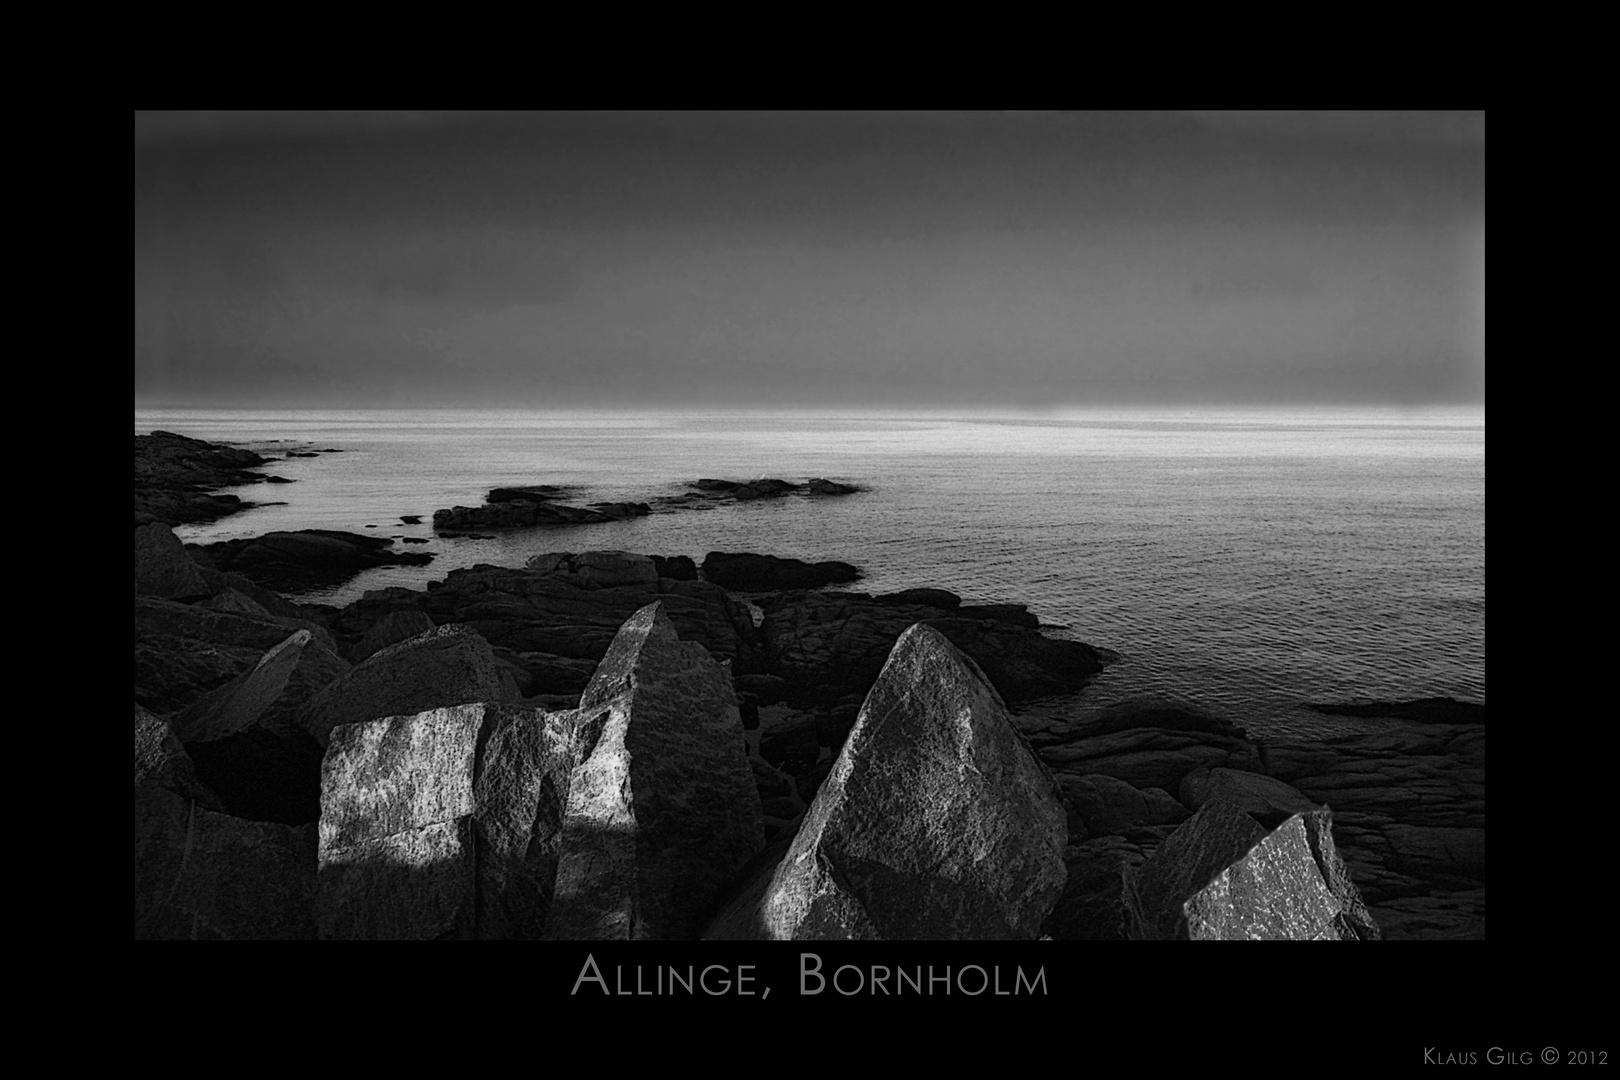 Bornholm bei Allinge